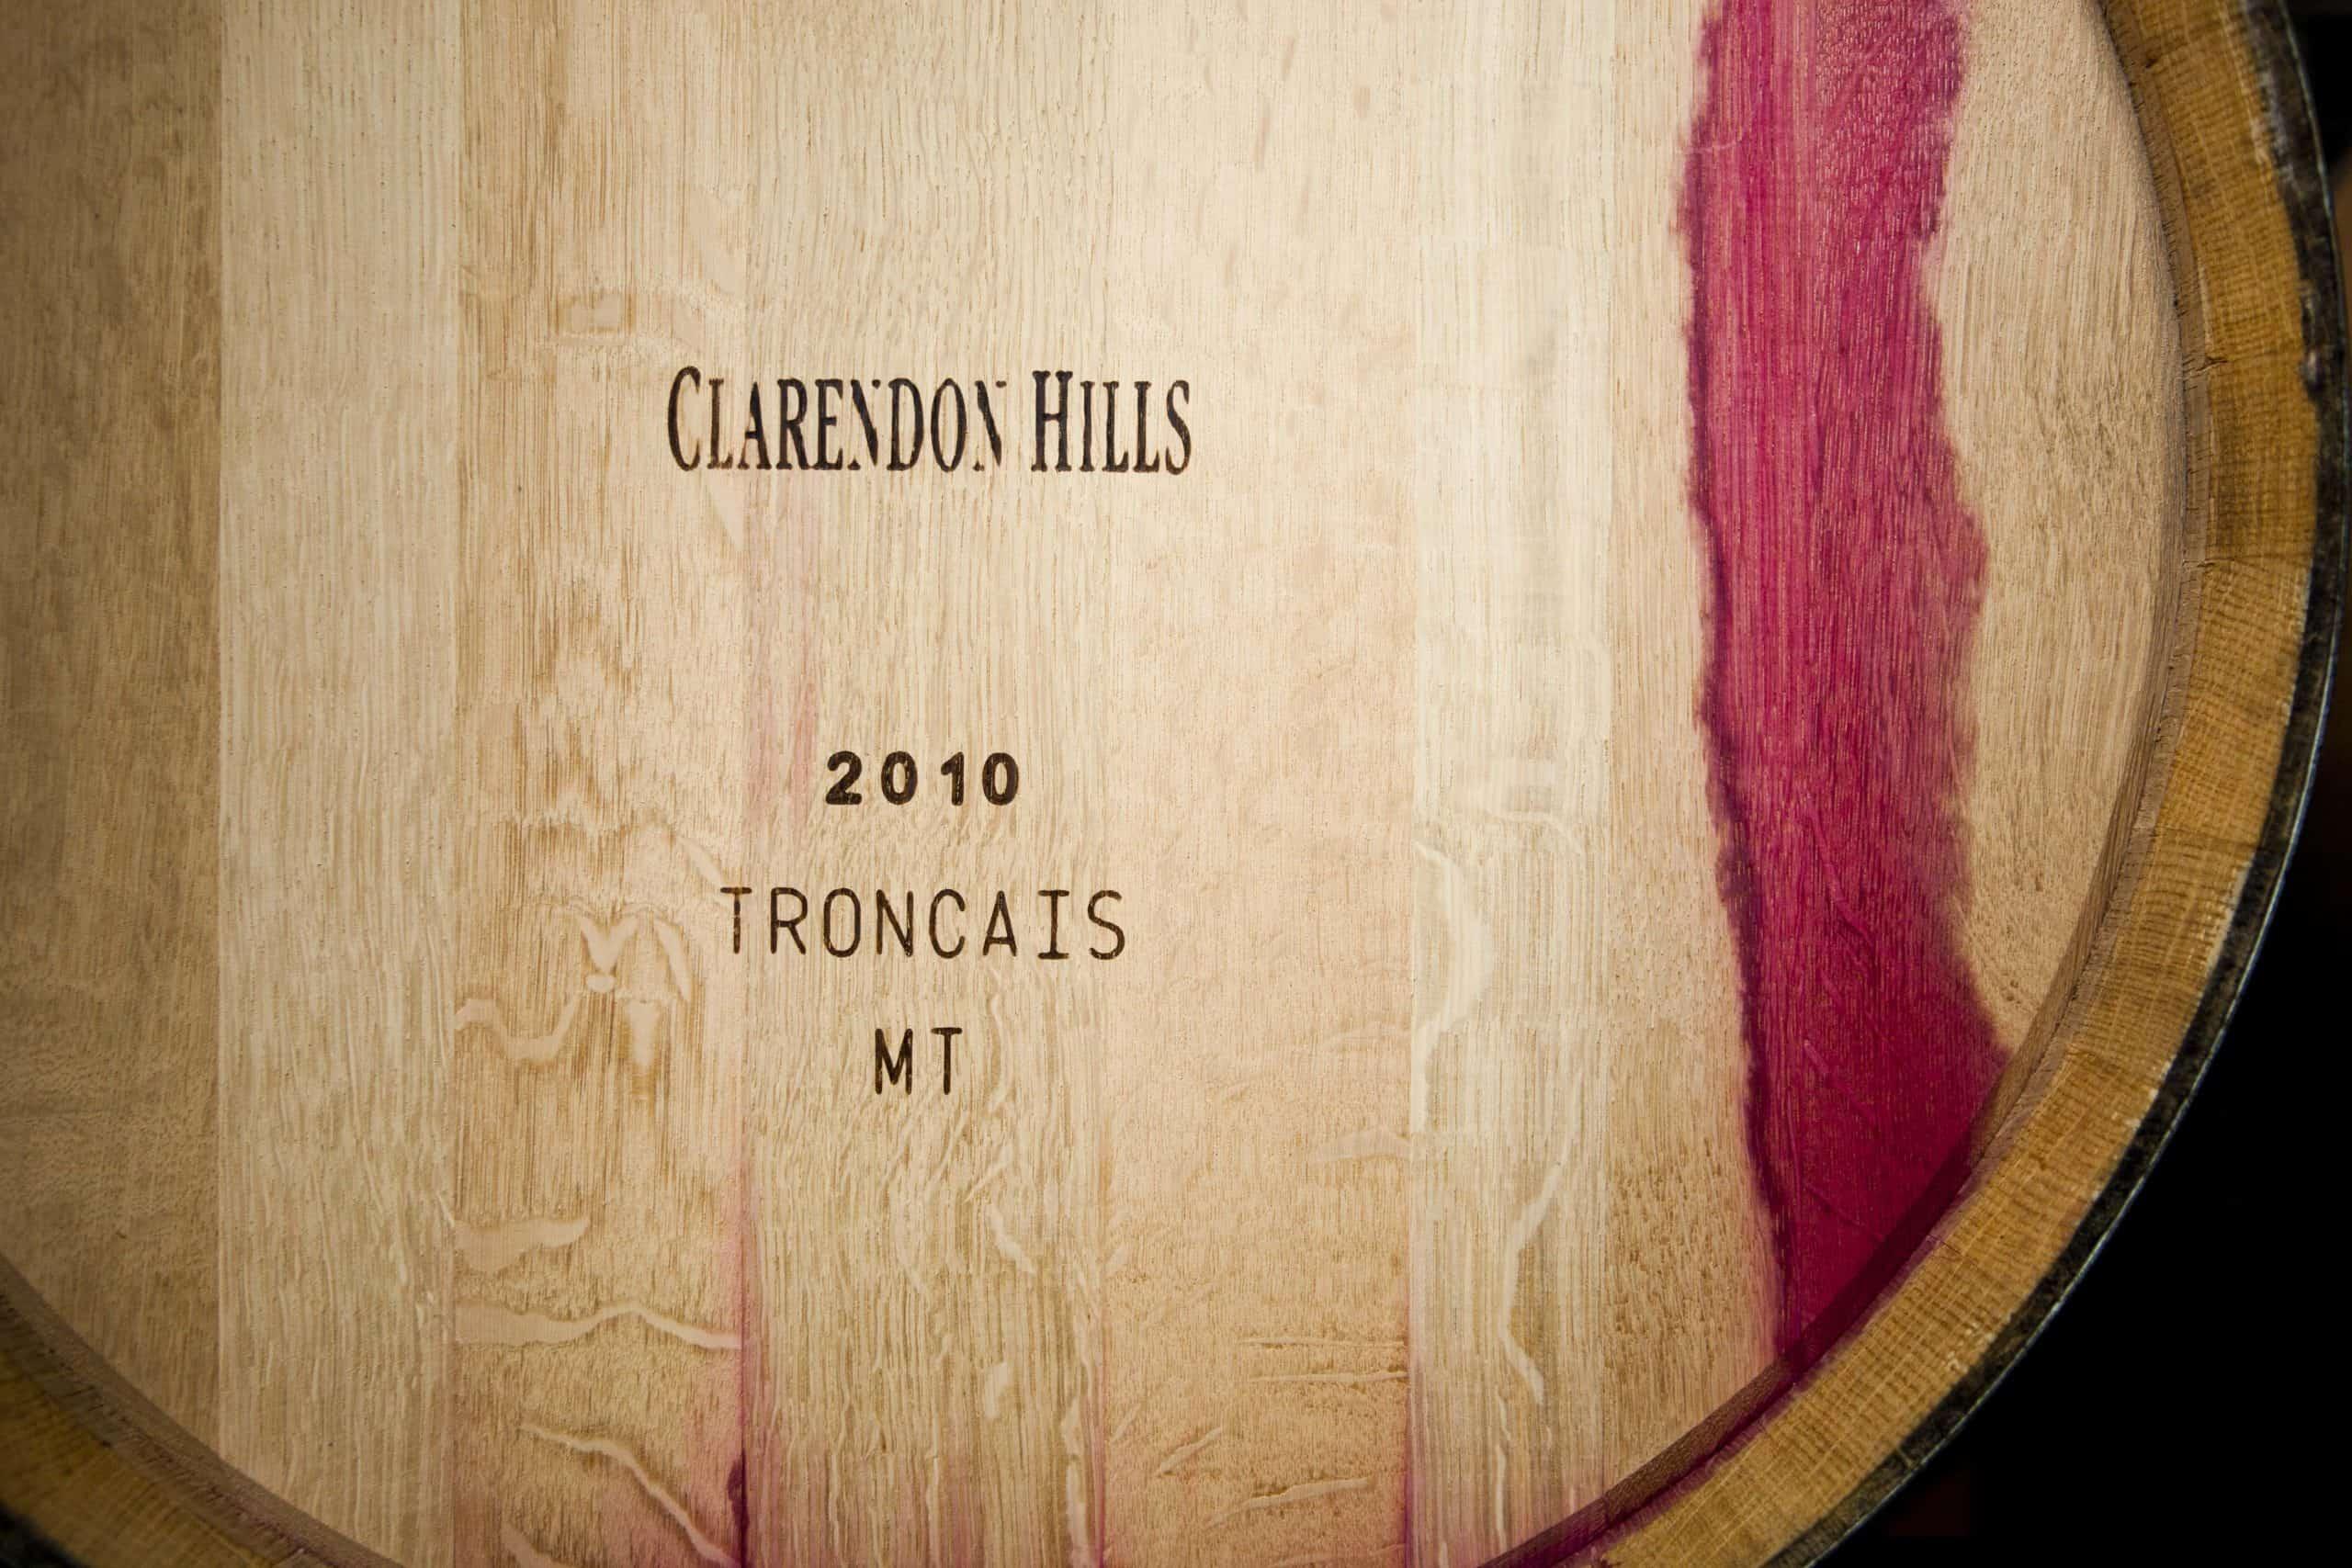 Clarendon Hills wine barrel for aging